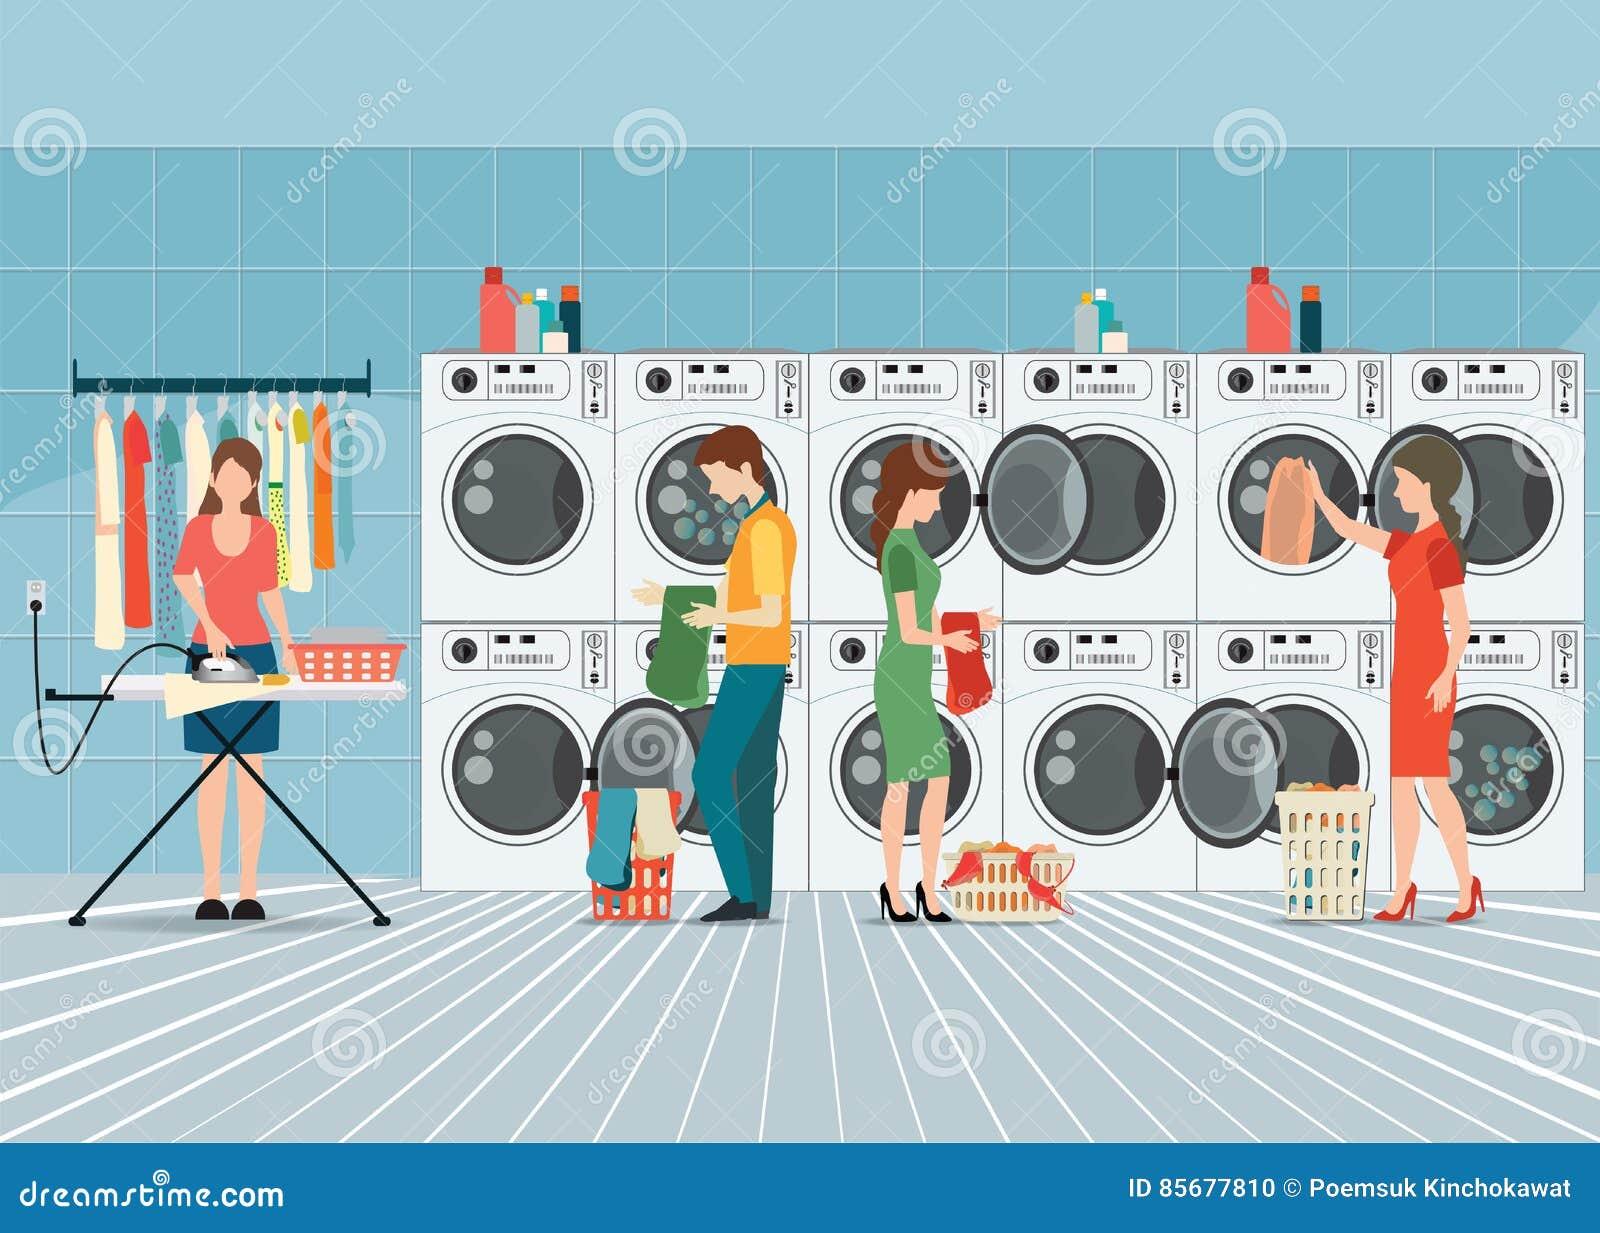 Man Doing Laundry Laundromat Shop Stock Illustrations – 7 Man ...